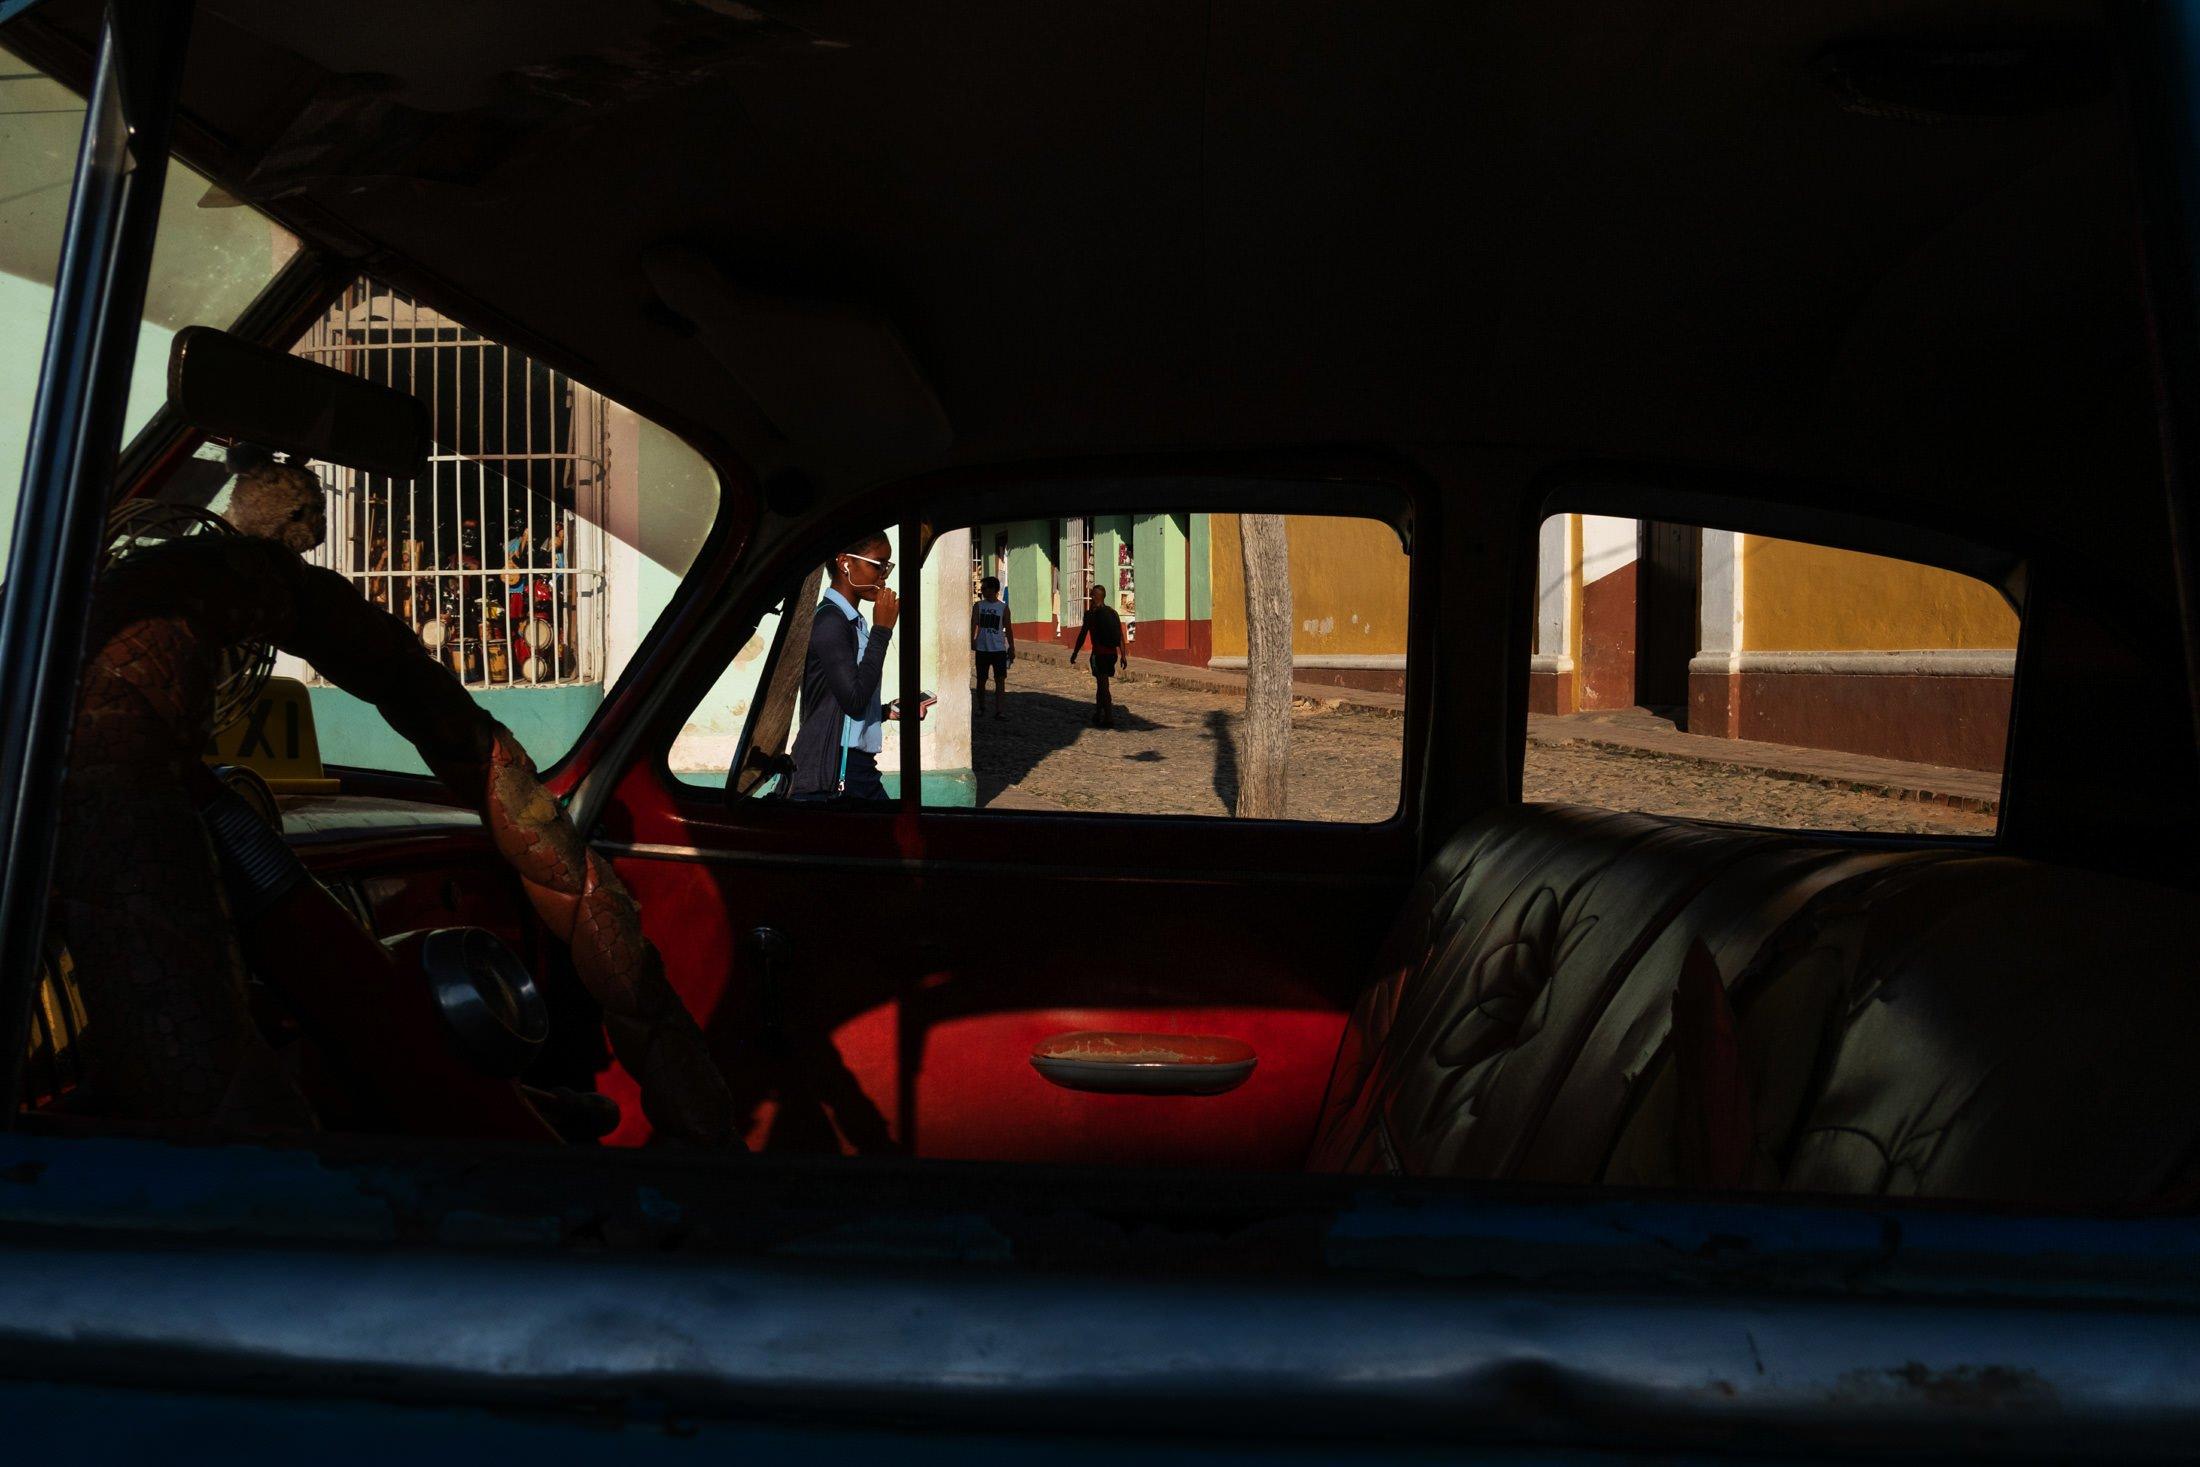 shooting through the car window, girl walking past on her ear phones in Trinidad, Cuba